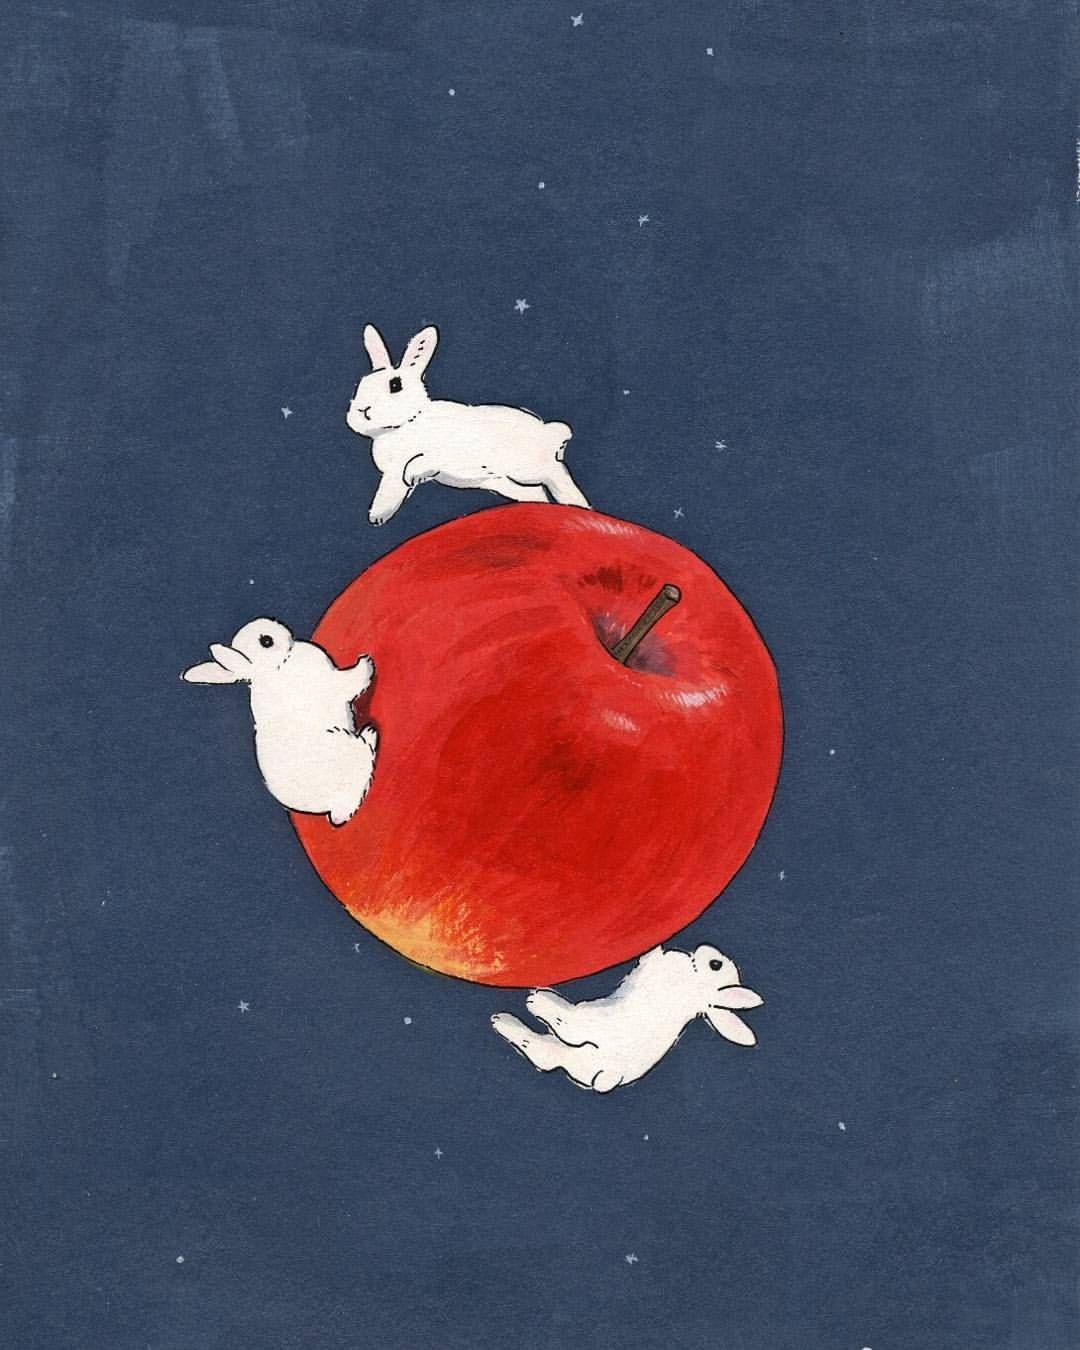 apple with happy bunnies🐇 My bun loves apples!🍎 How